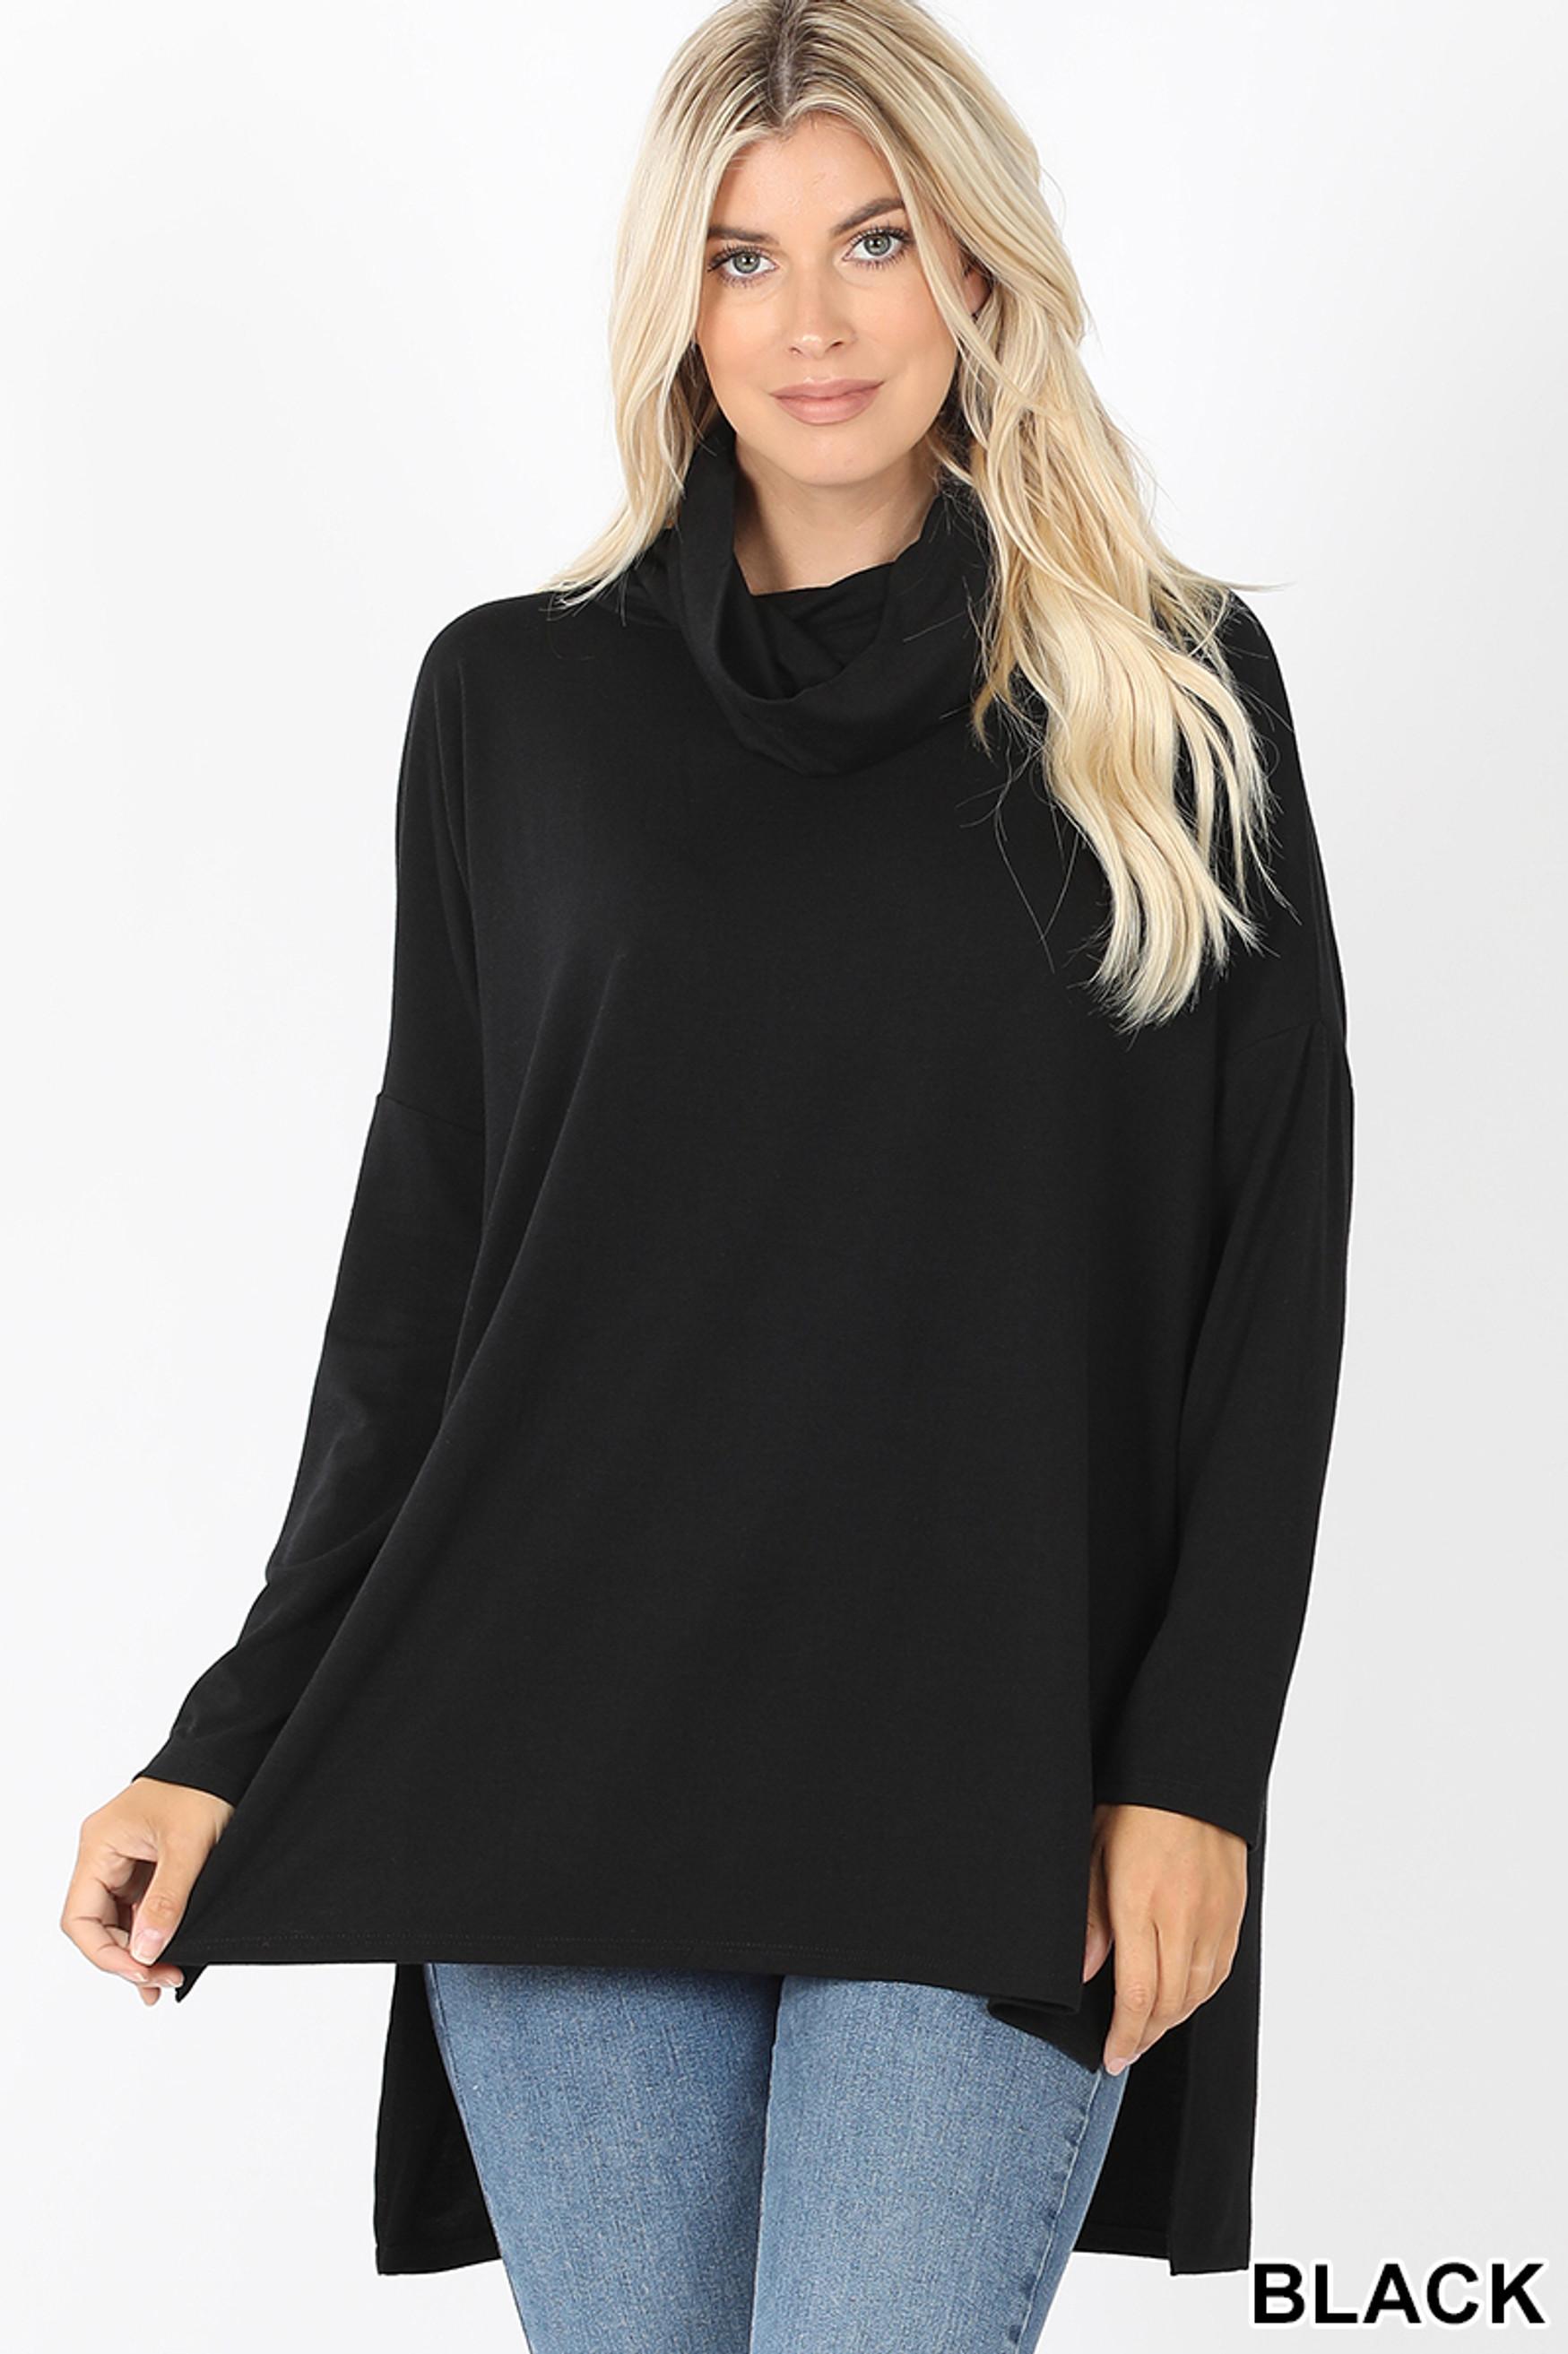 Front image of Black Cowl Neck Hi-Low Long Sleeve Top